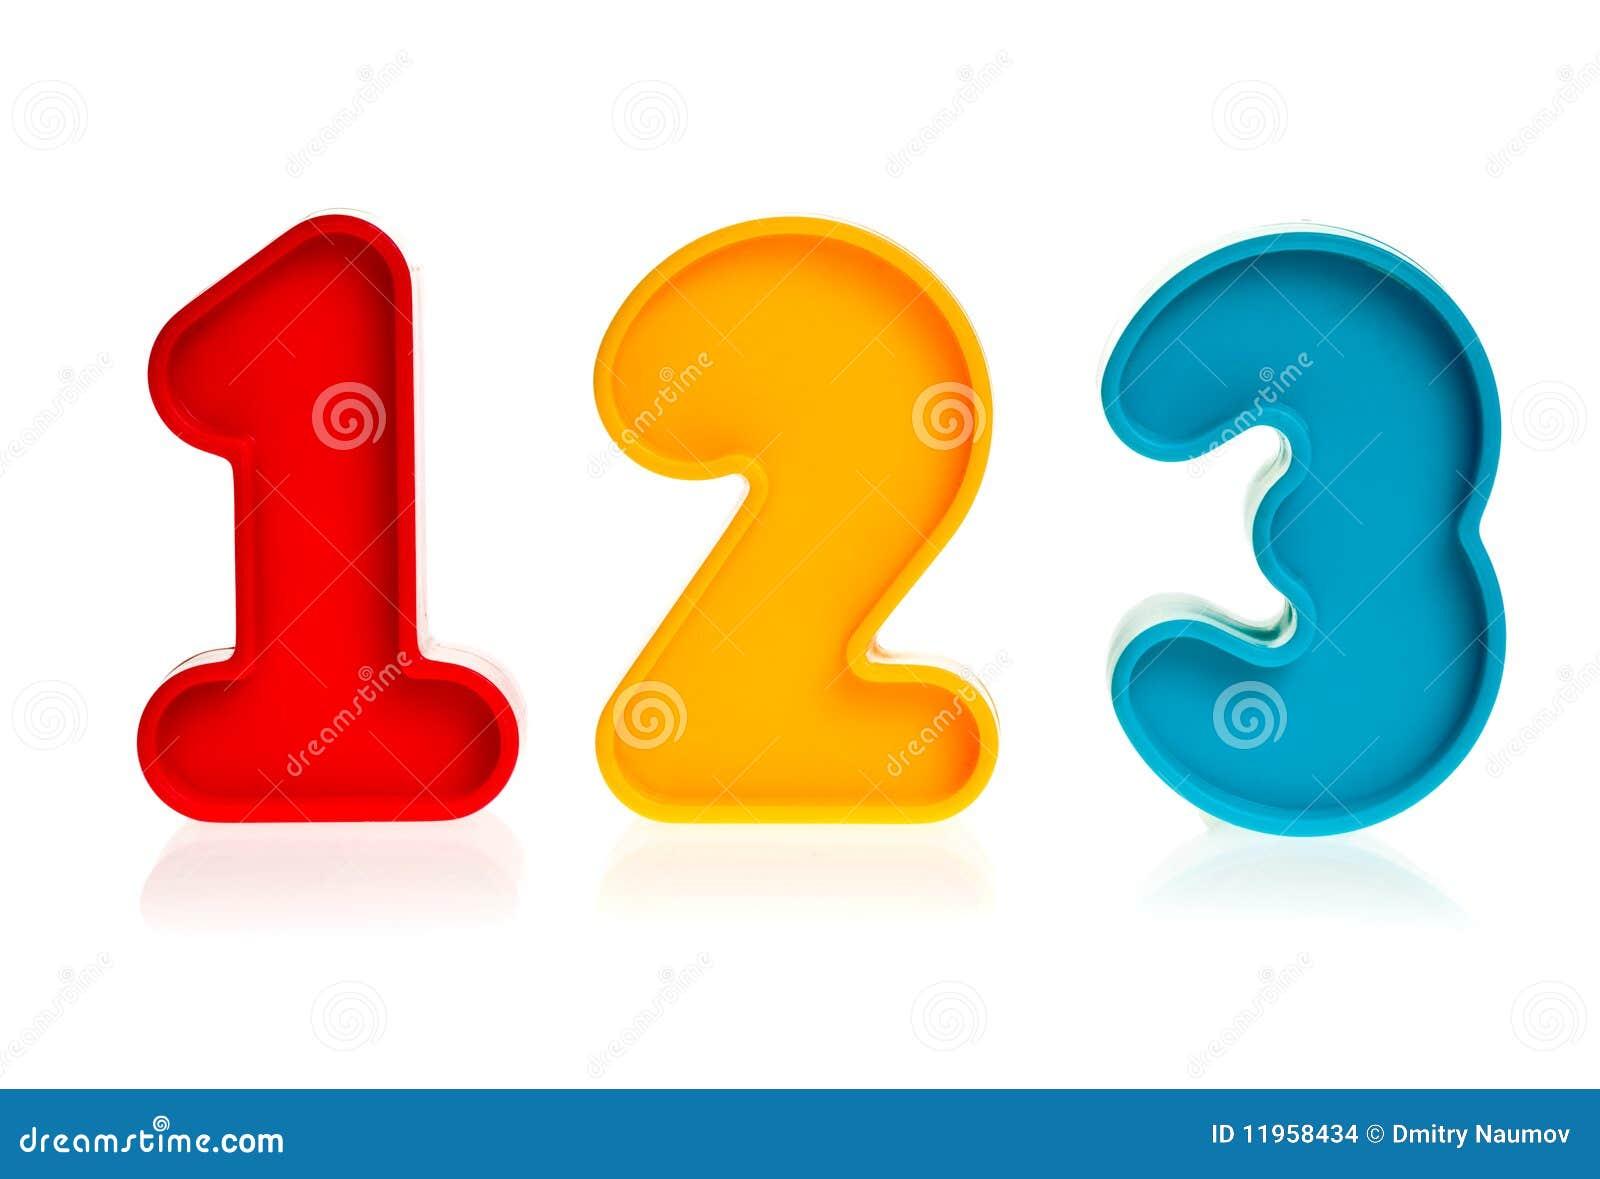 plastic numbers 123 stock images image 11958434. Black Bedroom Furniture Sets. Home Design Ideas